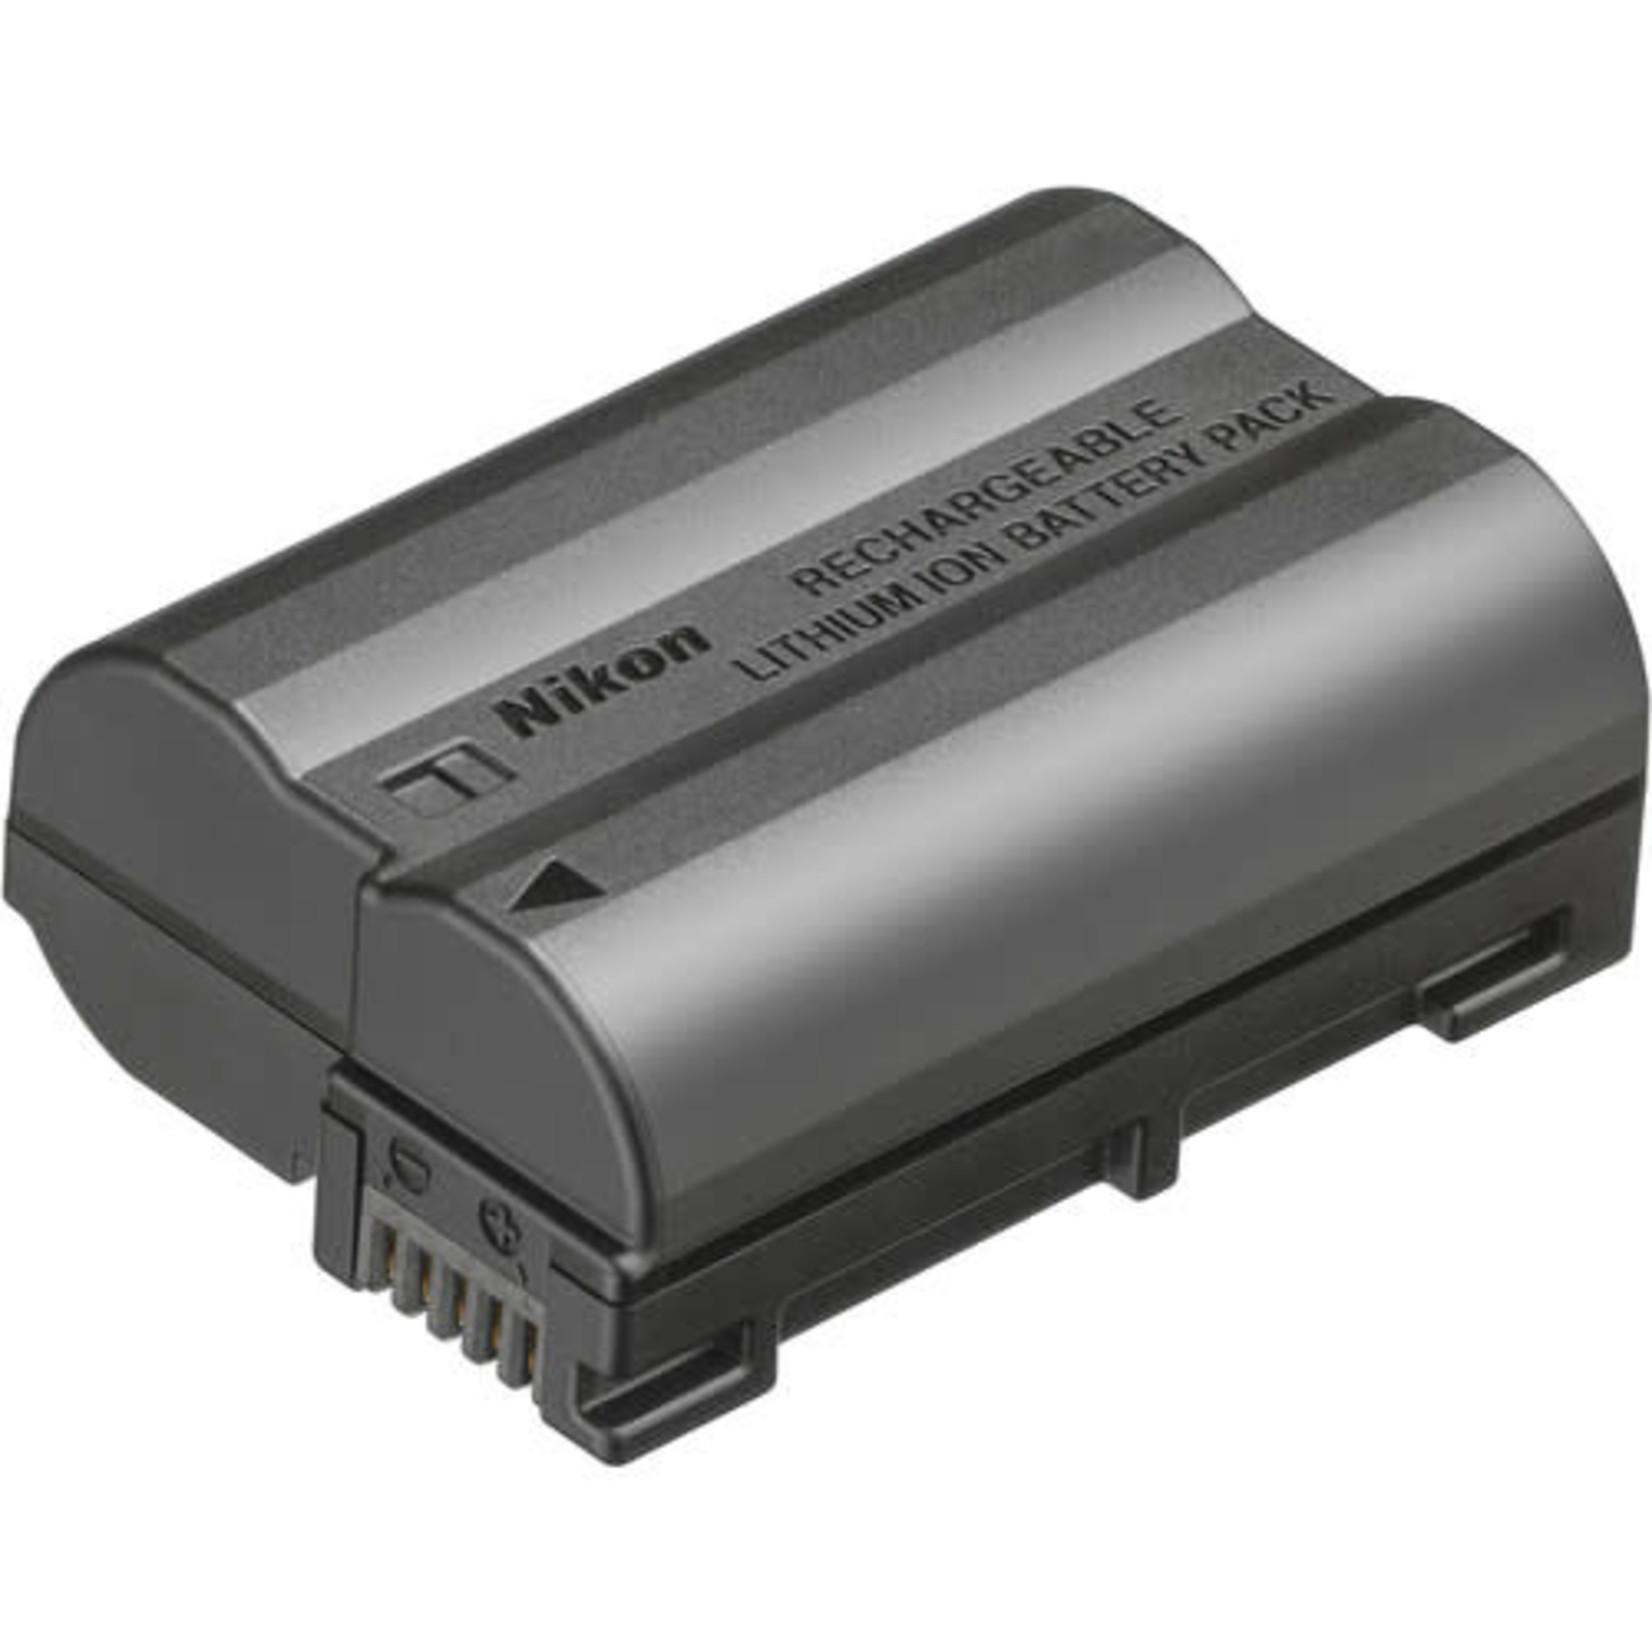 Nikon Nikon EN-EL15c Rechargeable Lithium-Ion Battery